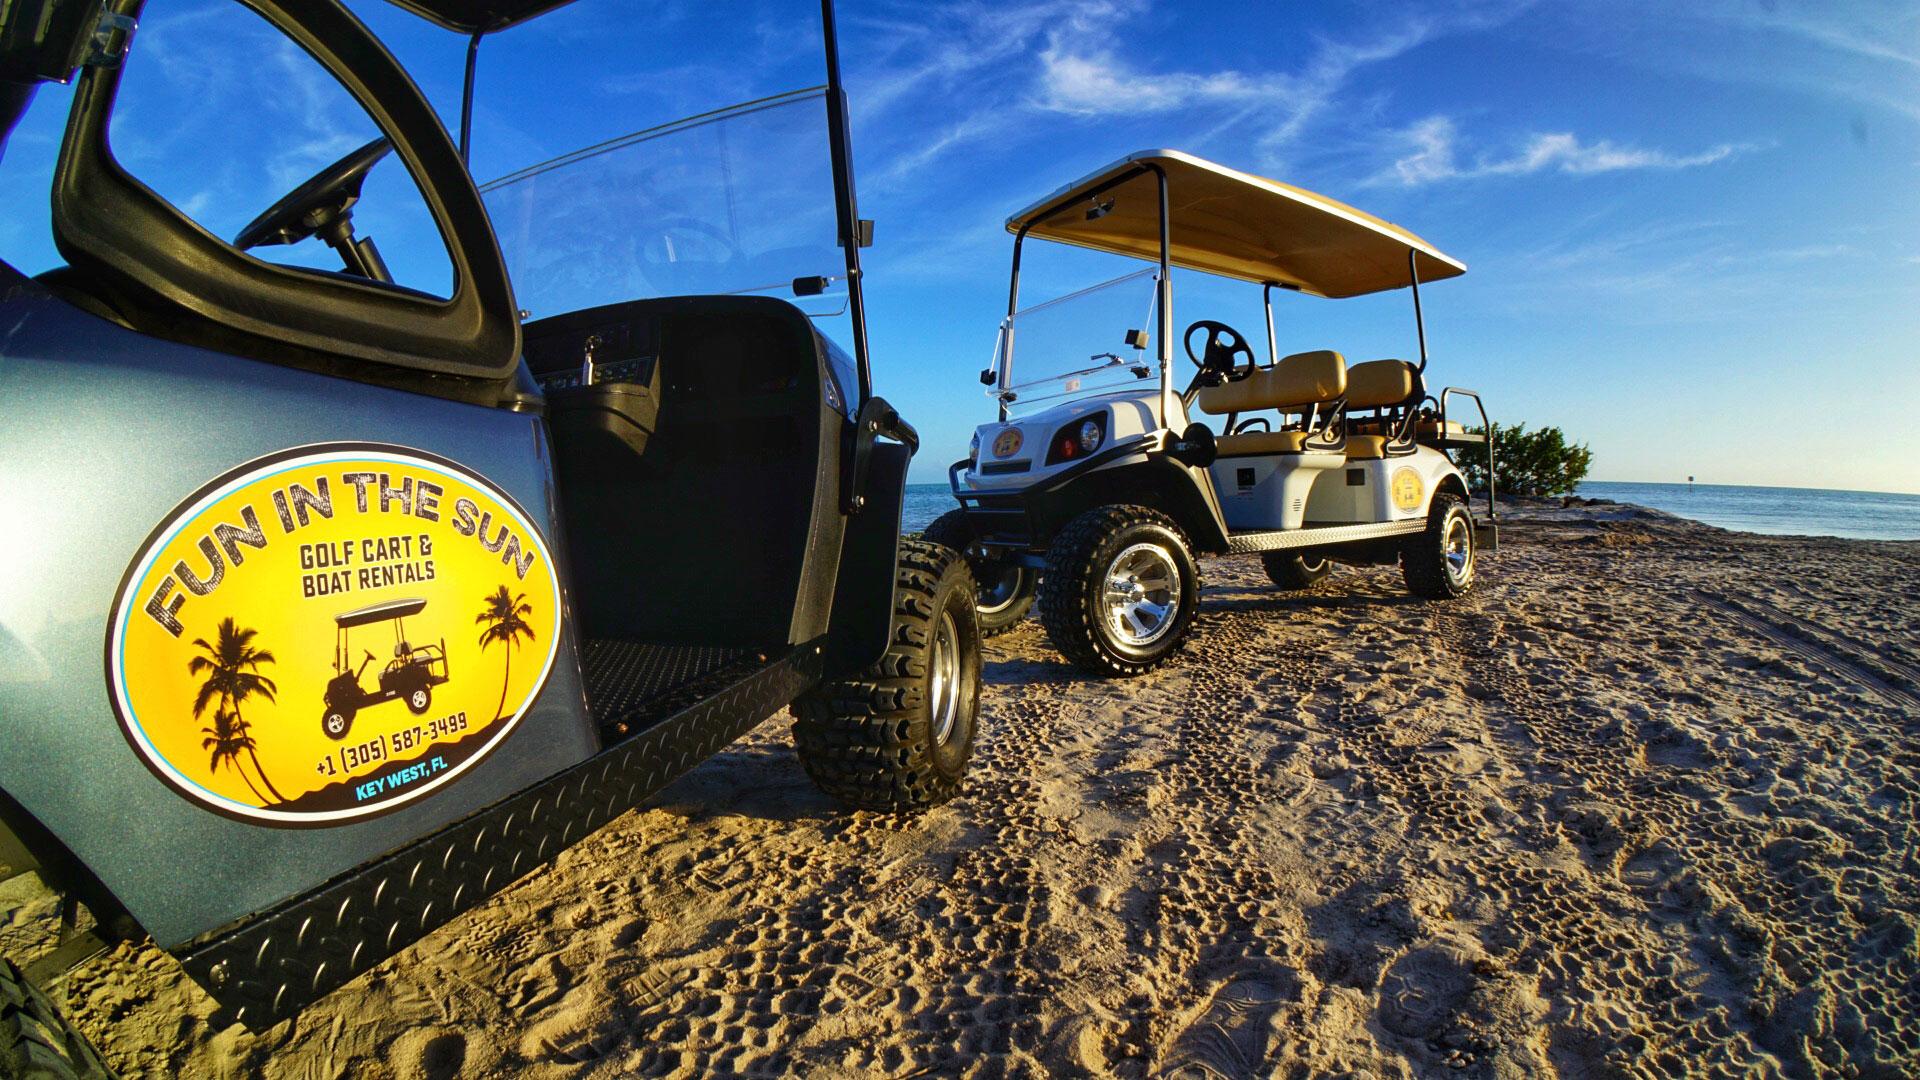 EZ GO Golf Carts in Key West